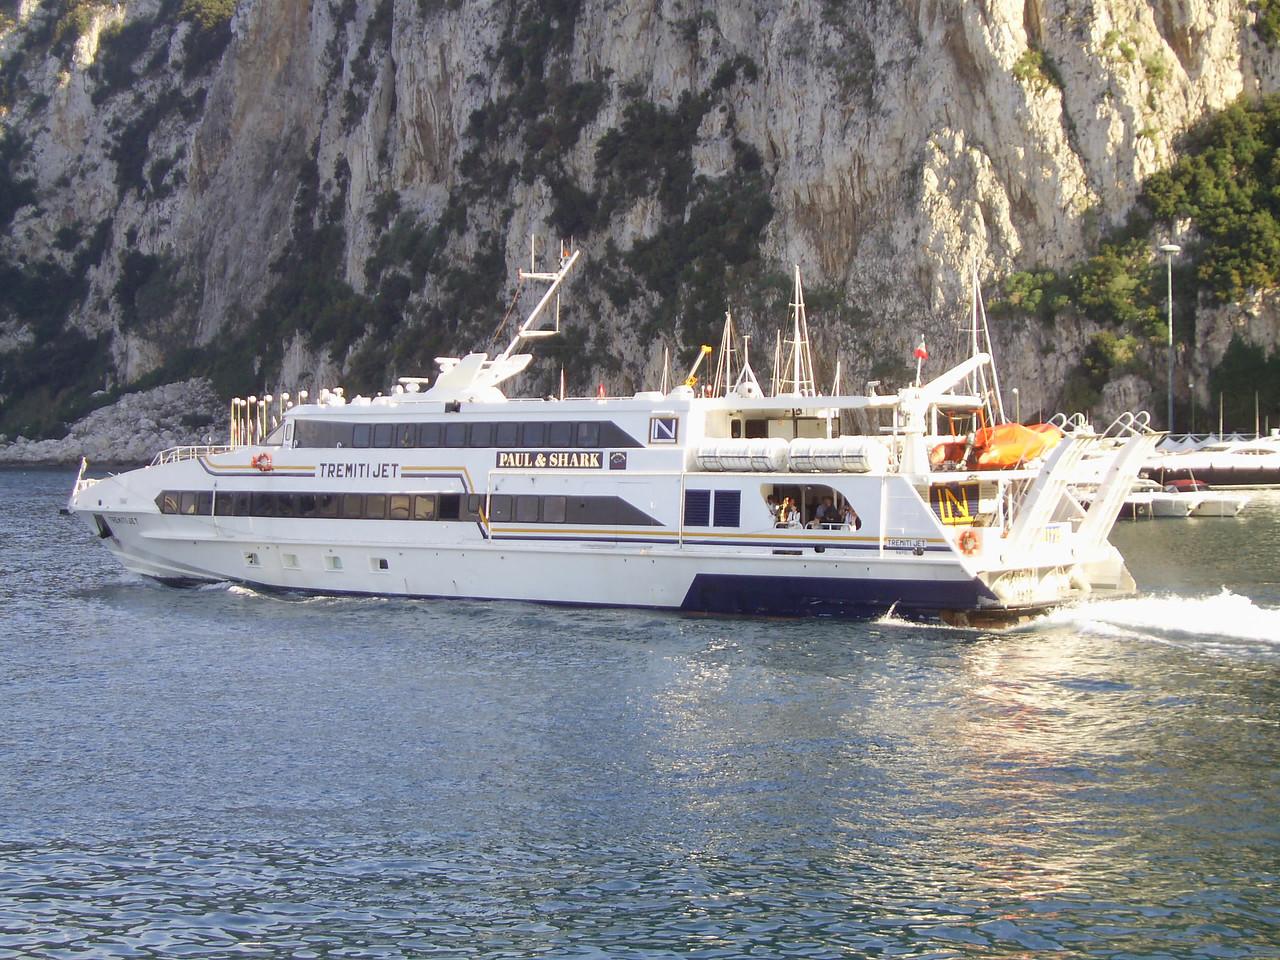 2007 - HSC TREMITI JET departing from Capri.